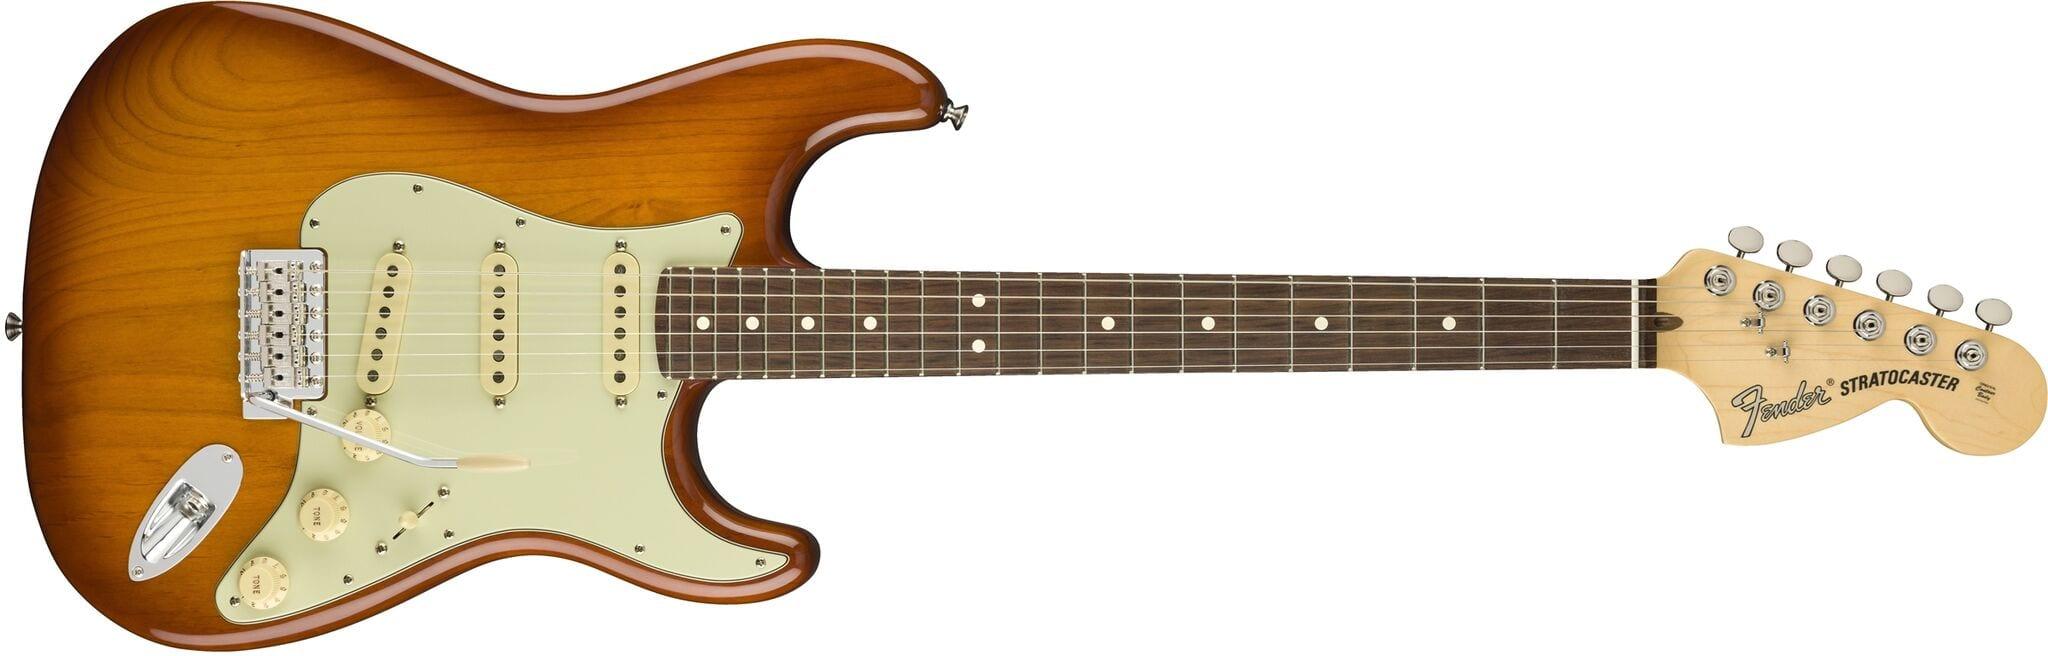 Fender American Performer Series HSS Stratocaster